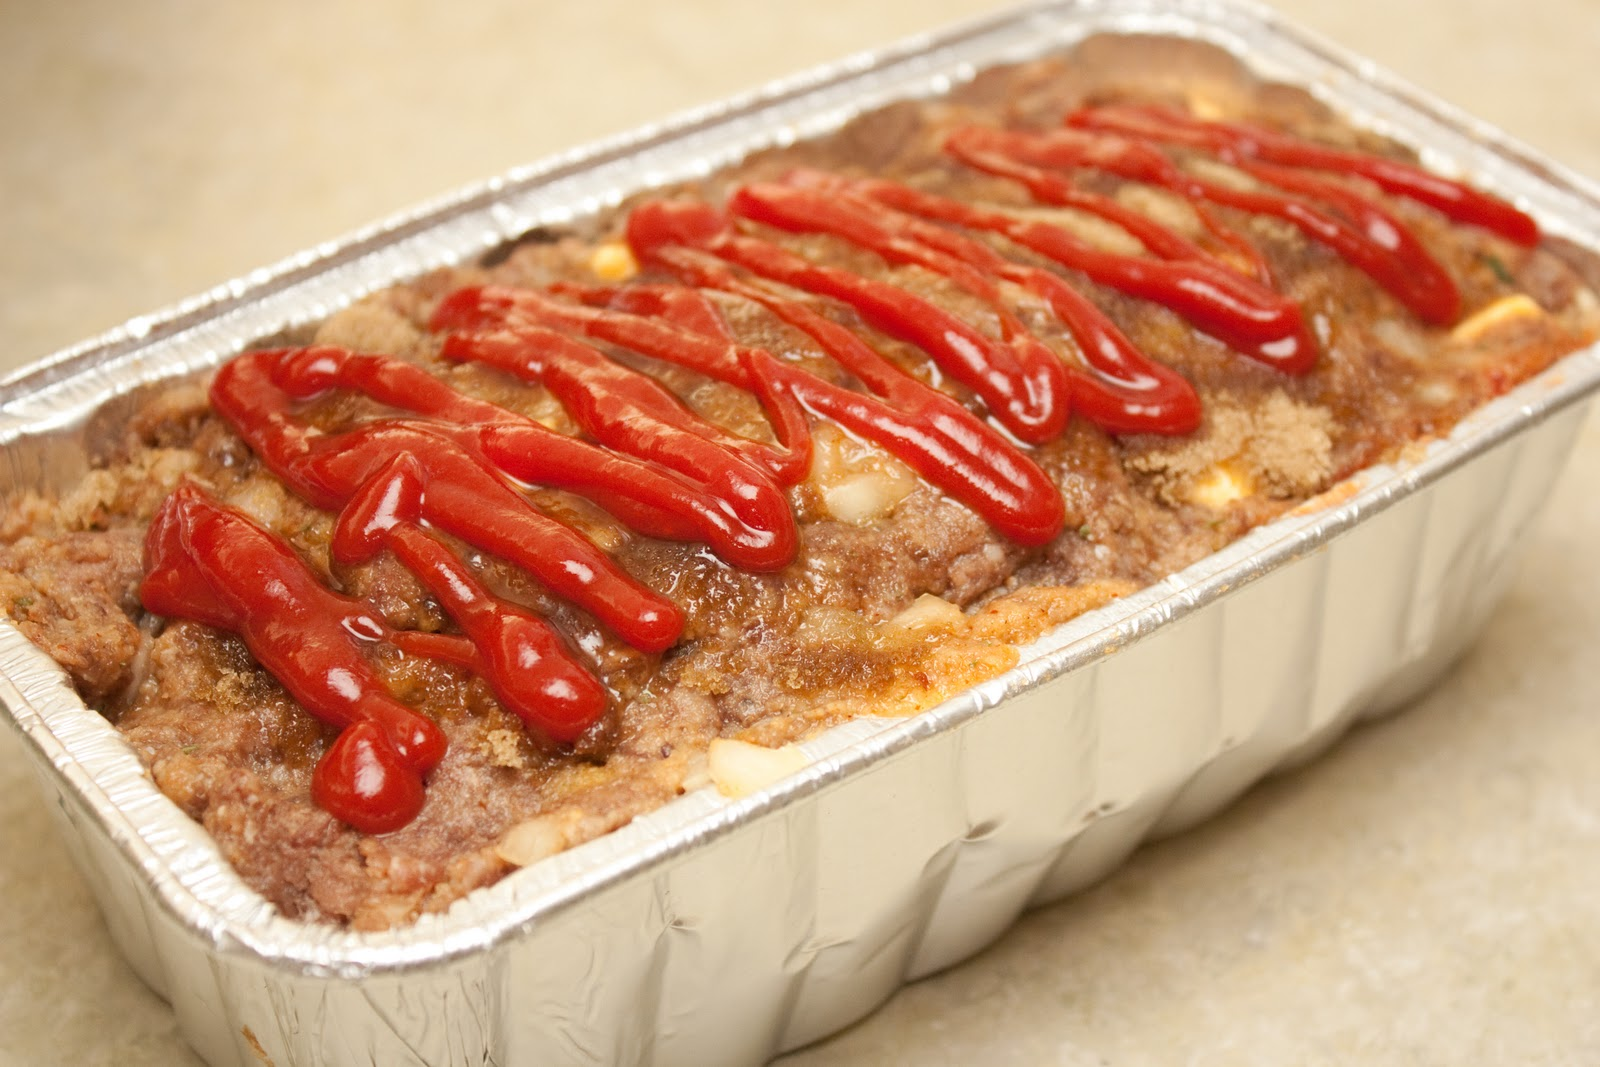 ... meatloaf chipotle meatloaf easy meatloaf paula deen s cheesy meatloaf